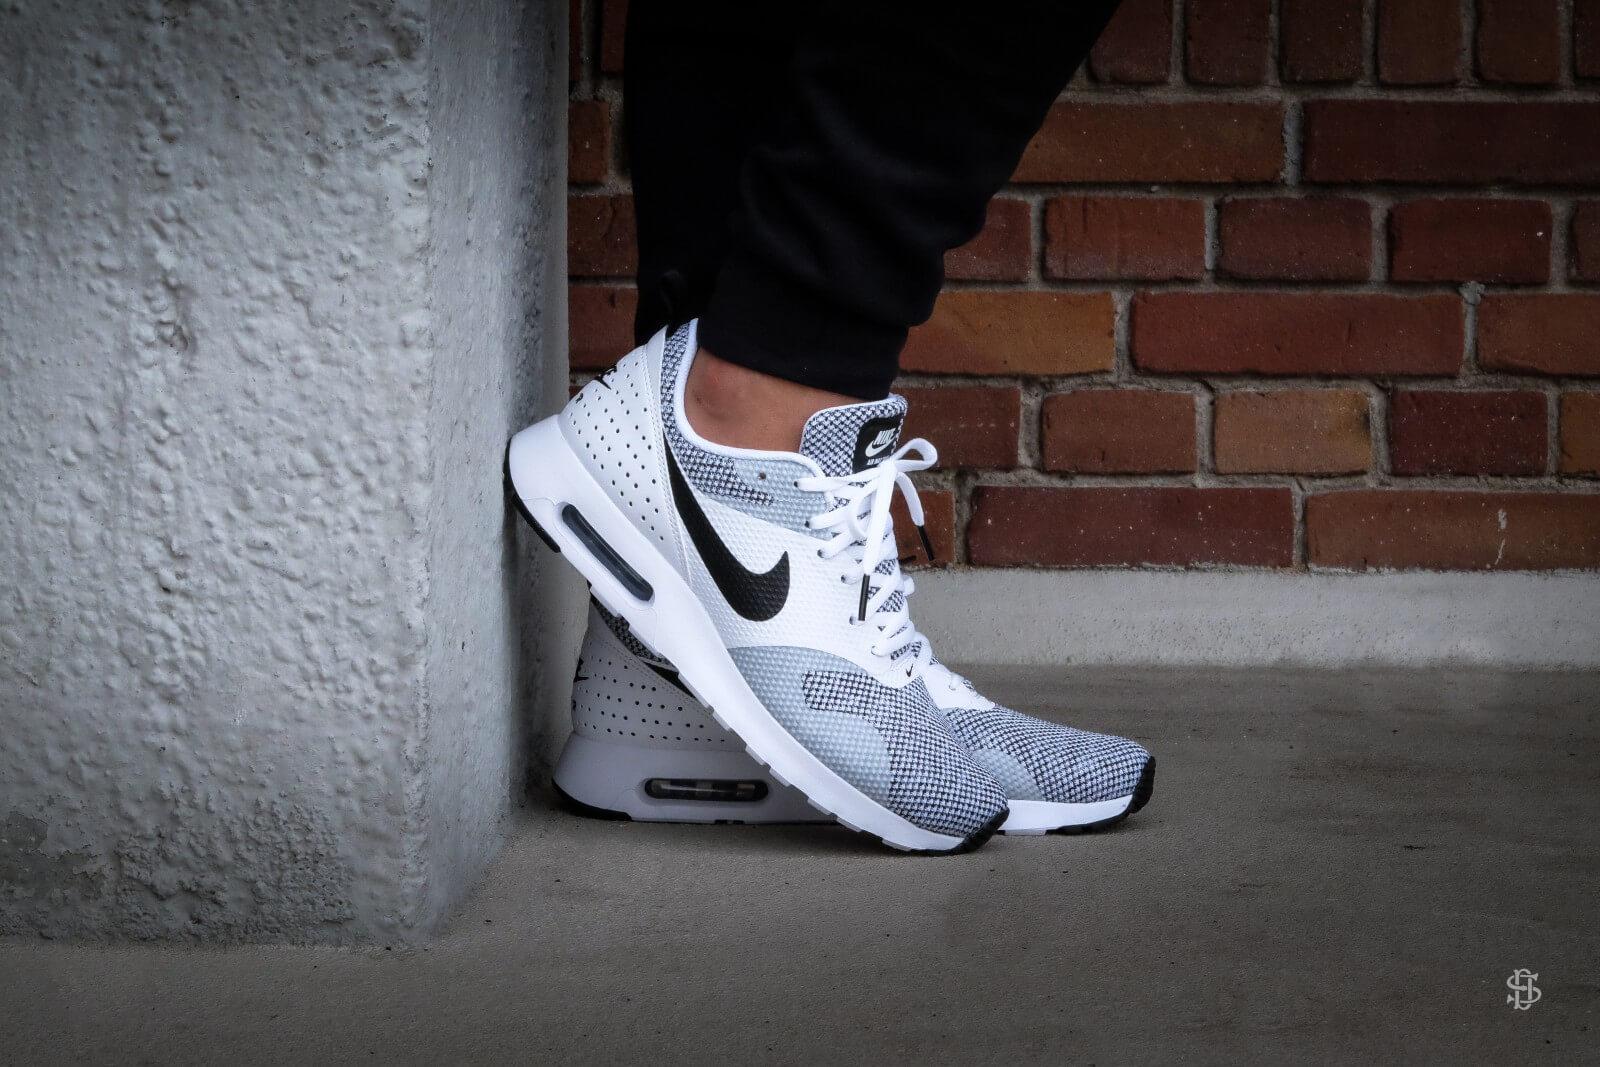 Nike Air Max Tavas PRM White Black Pure Platinum 898016 100